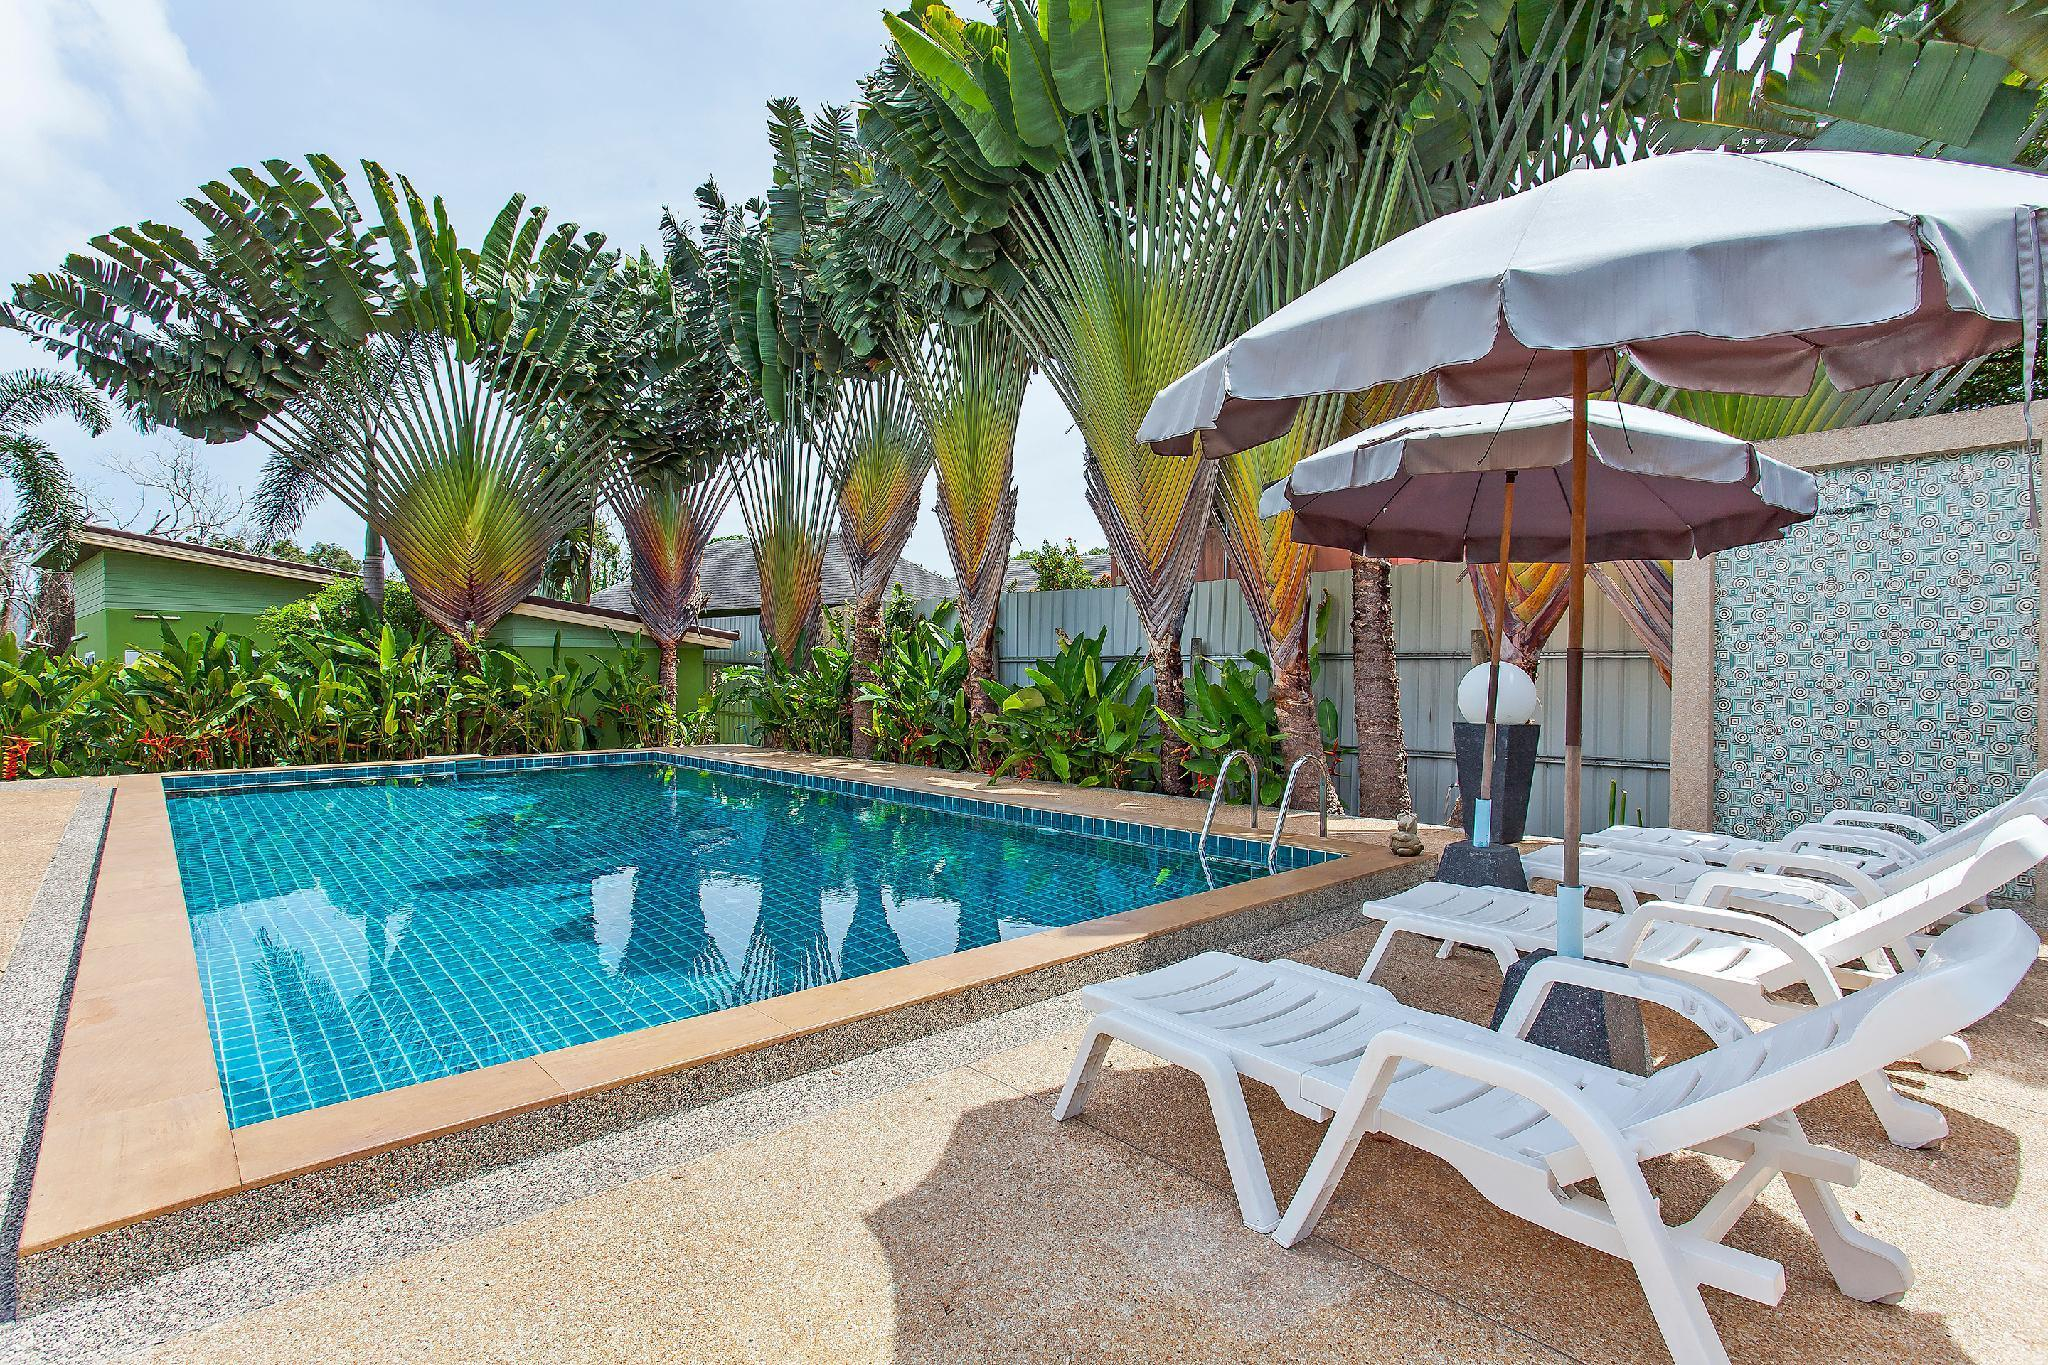 Modern Garden Resort 9BR w/ Pool & Breakfast วิลลา 9 ห้องนอน 9 ห้องน้ำส่วนตัว ขนาด 2400 ตร.ม. – บางเทา